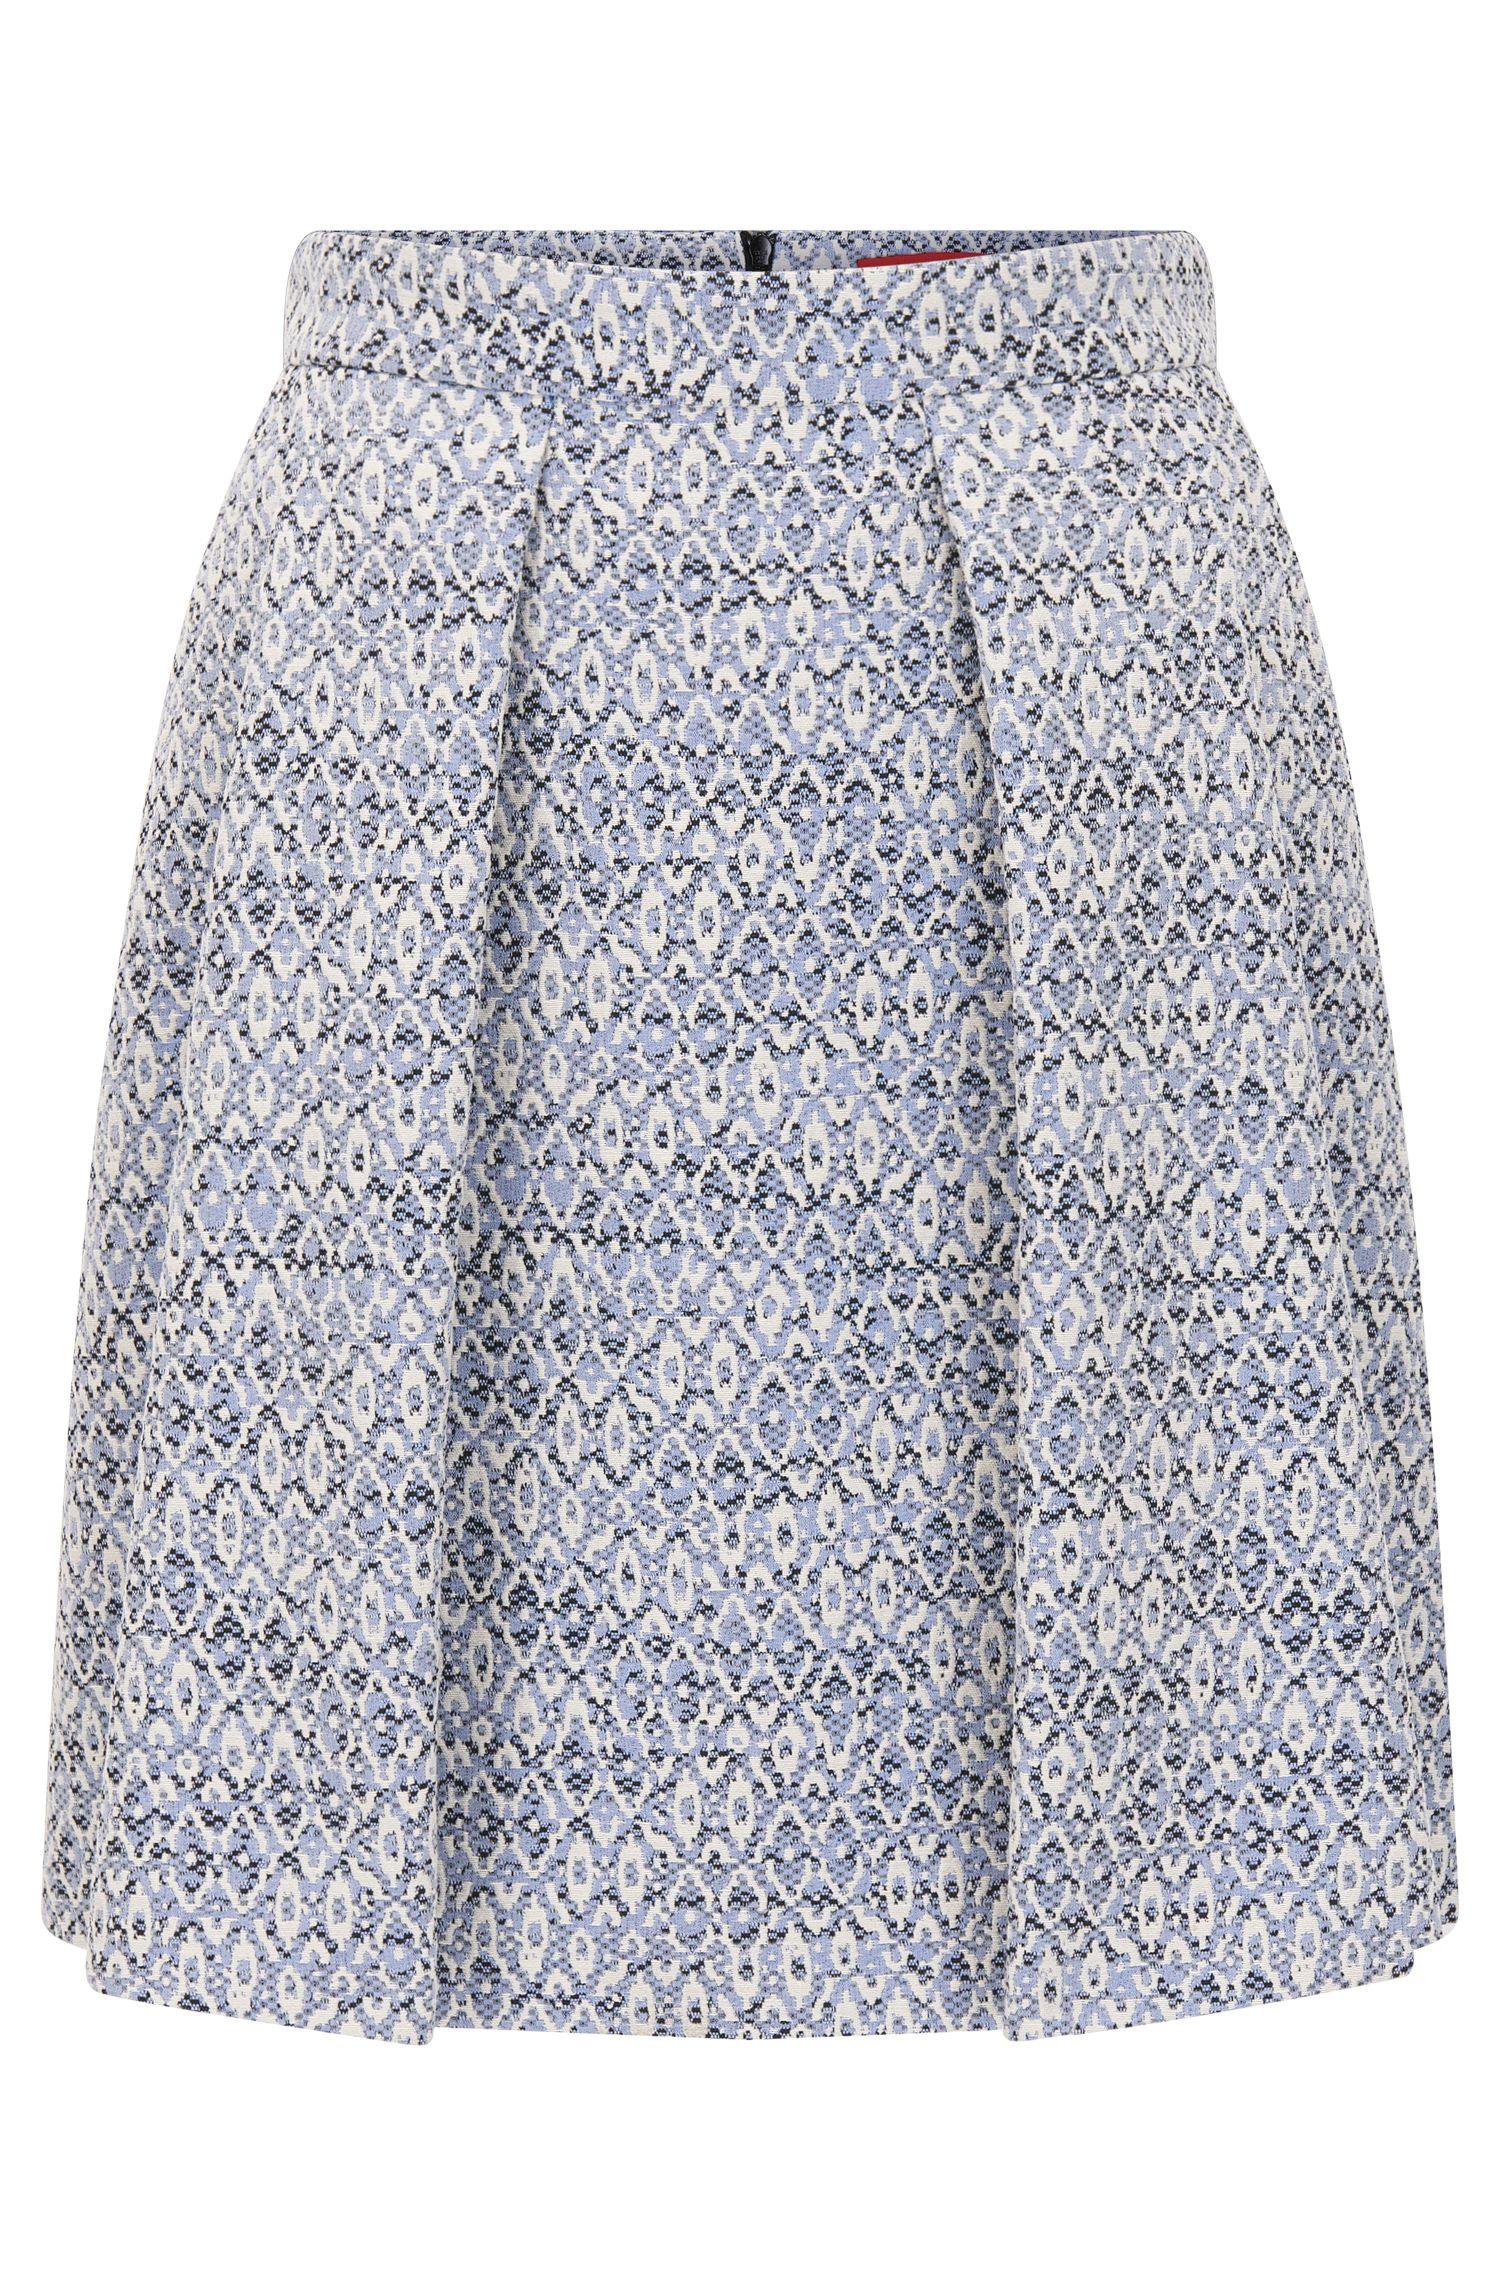 Regular-fit skirt in cotton-blend jacquard